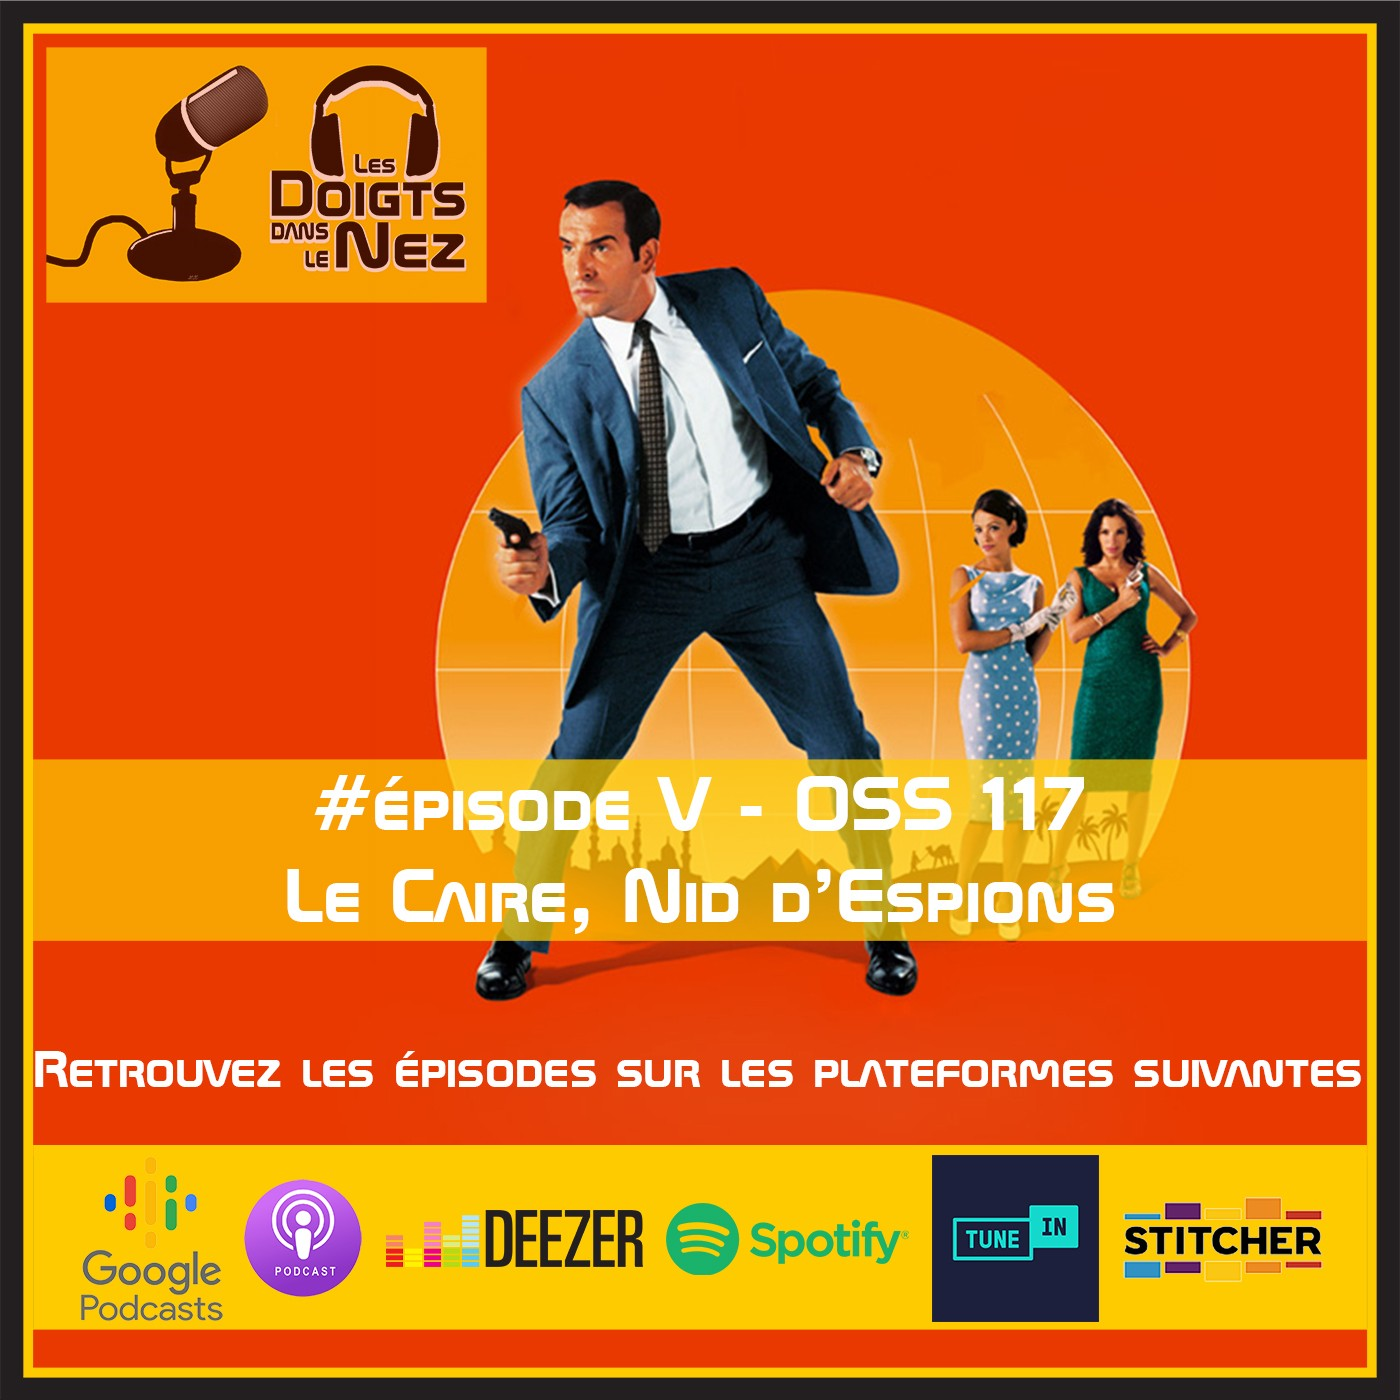 #Episode V - OSS 117 - Le Caire, nid d'espions